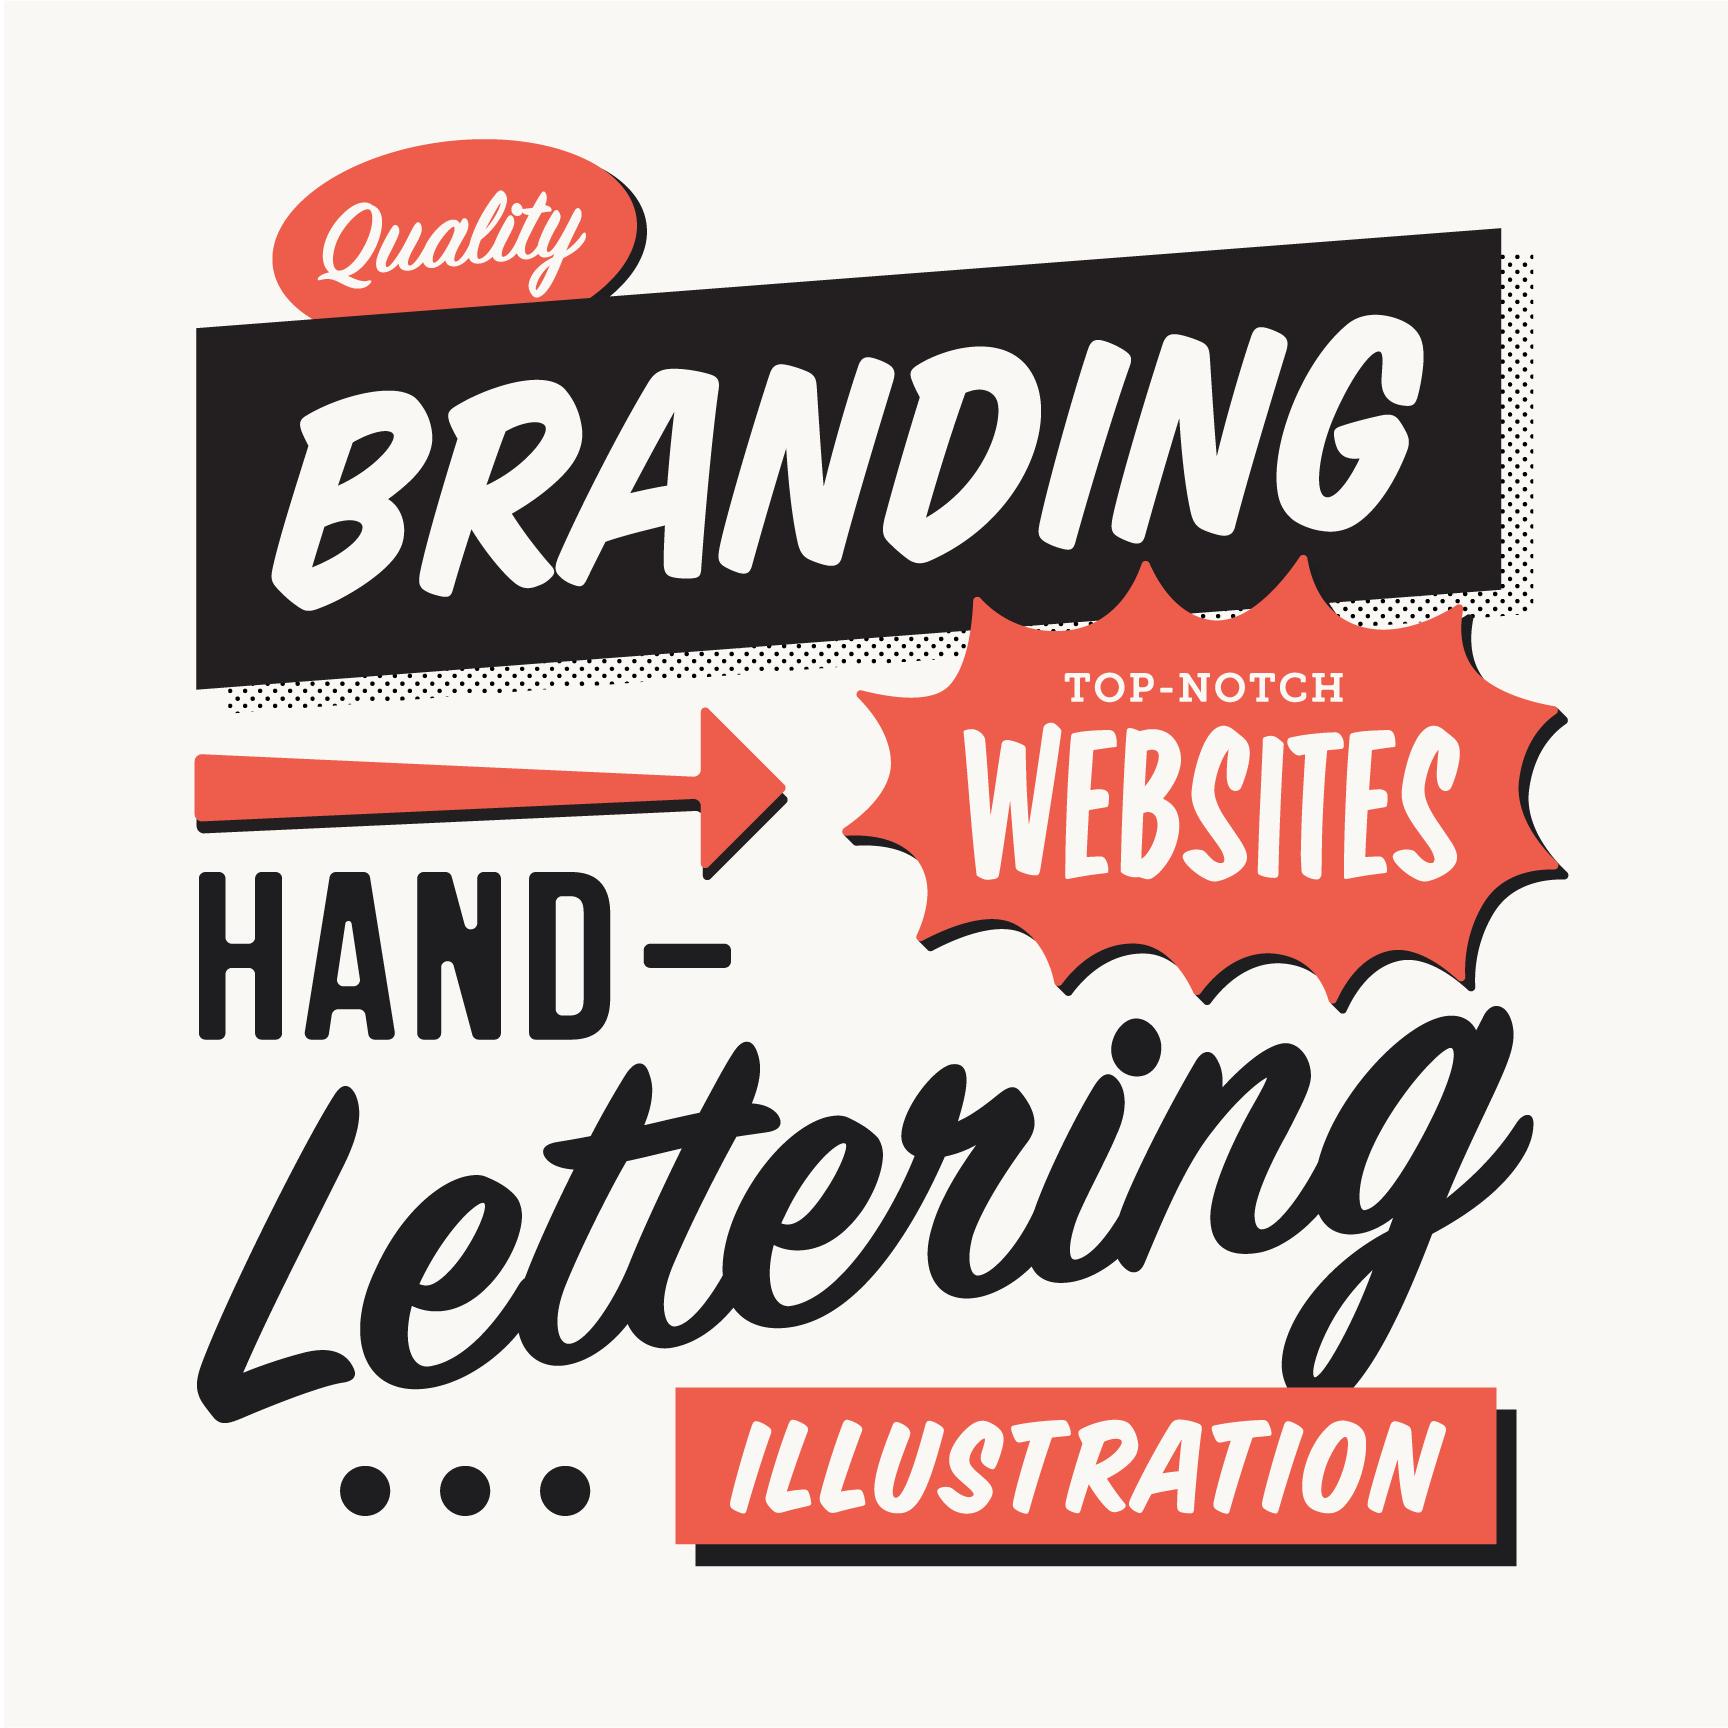 Katie Cooper High-Quality Branding, Brand Identity, Web Design, Websites, Hand-Lettering, Lettering, Illustration, Strategy